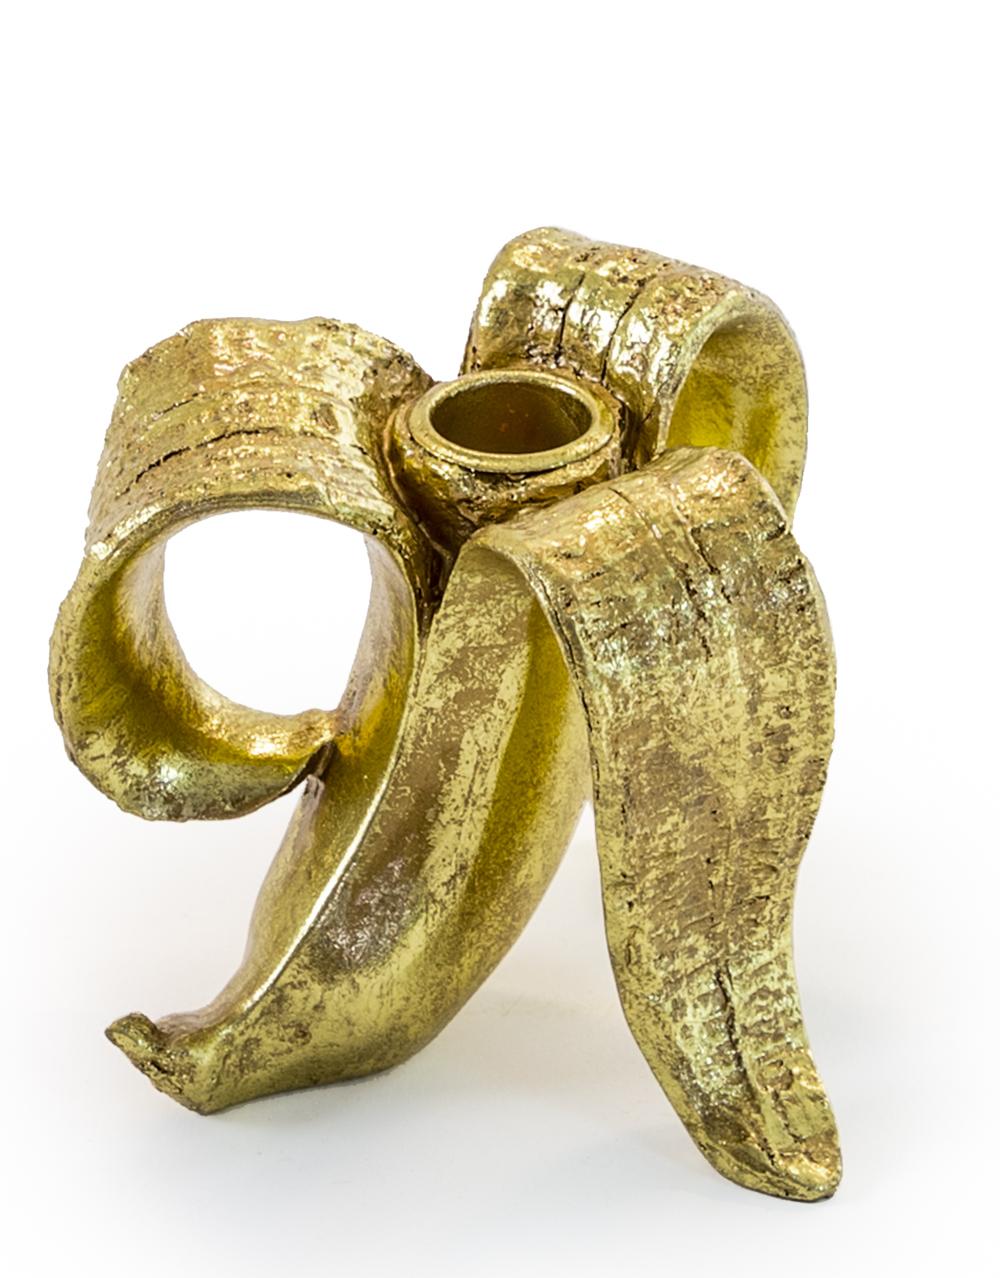 Gold Glam Banana Candle Holder